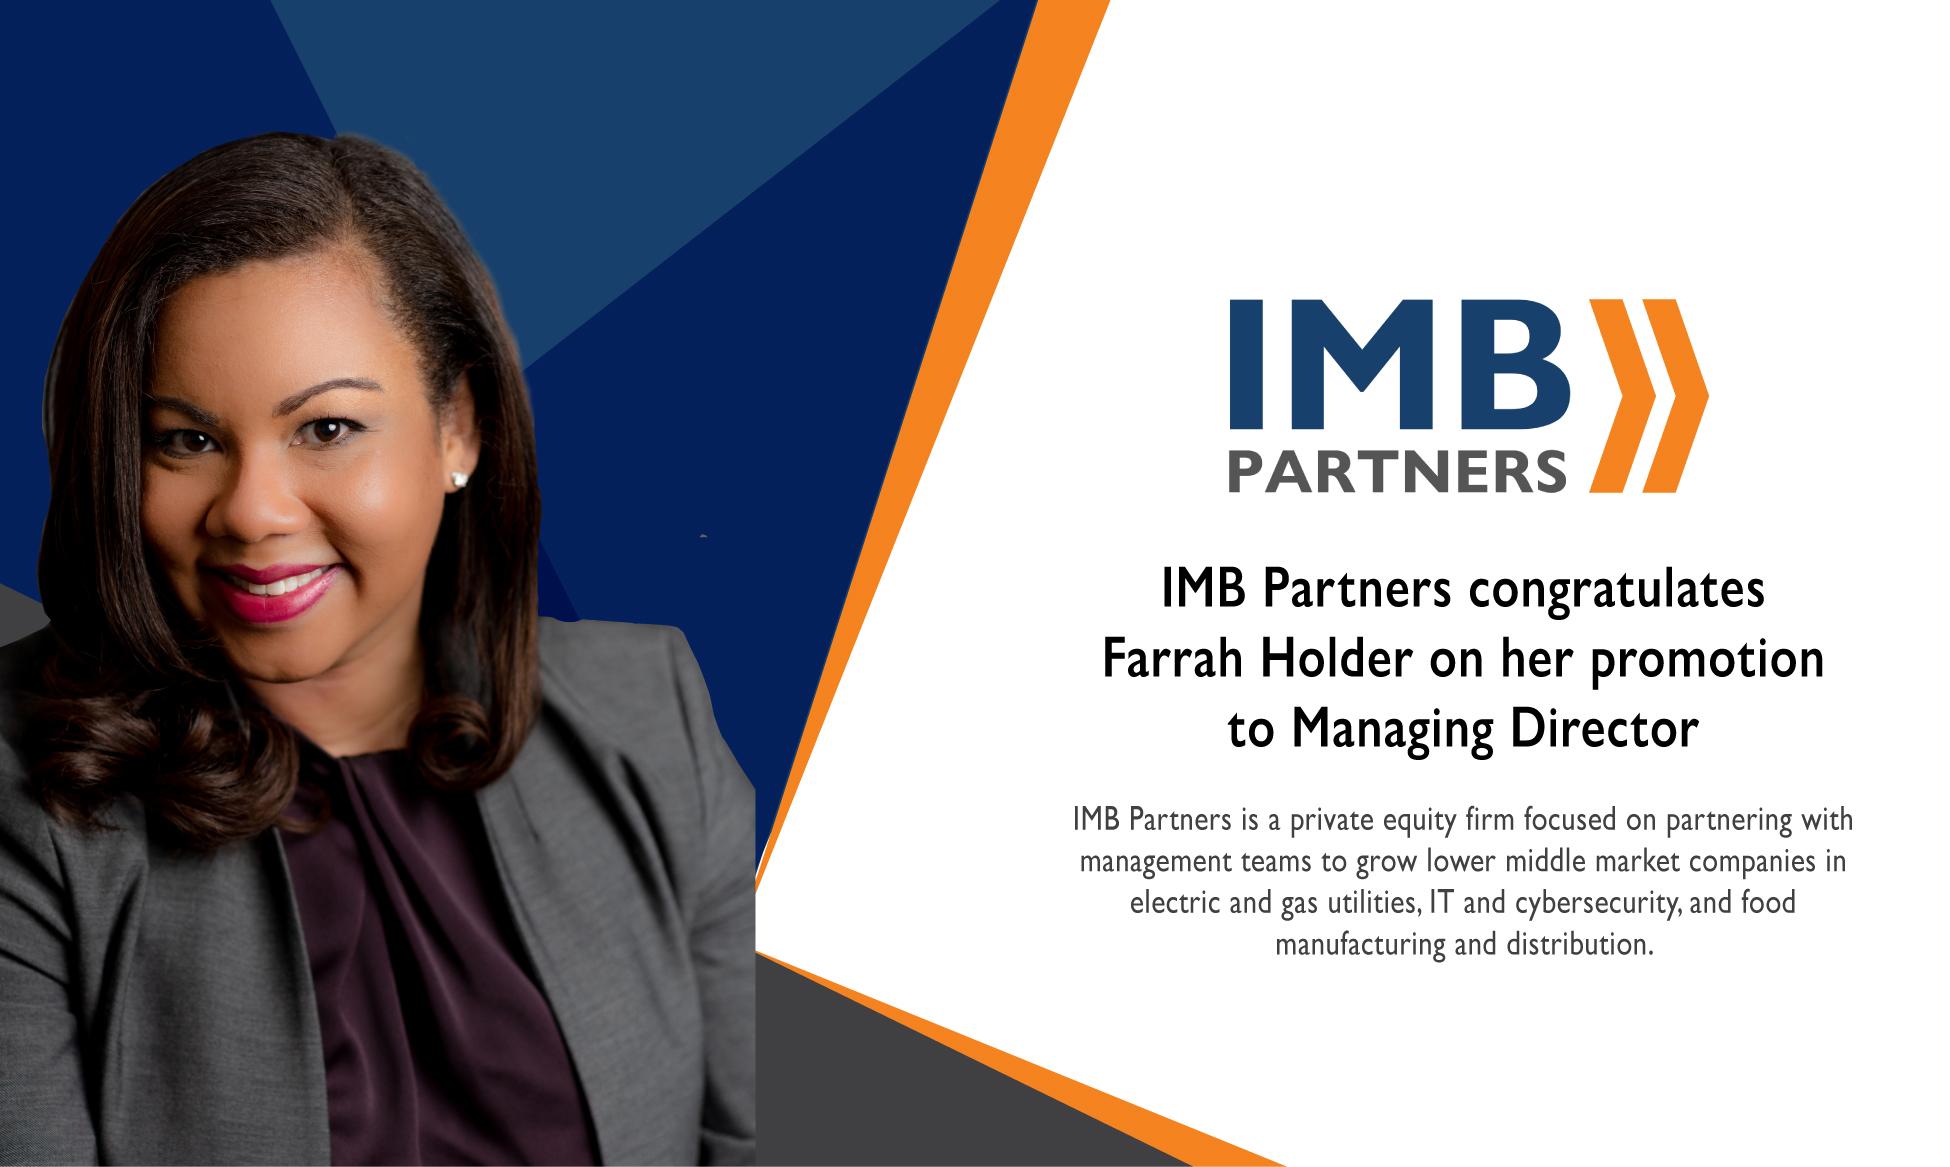 IMB Partners Promotes Farrah Holder to Managing Director